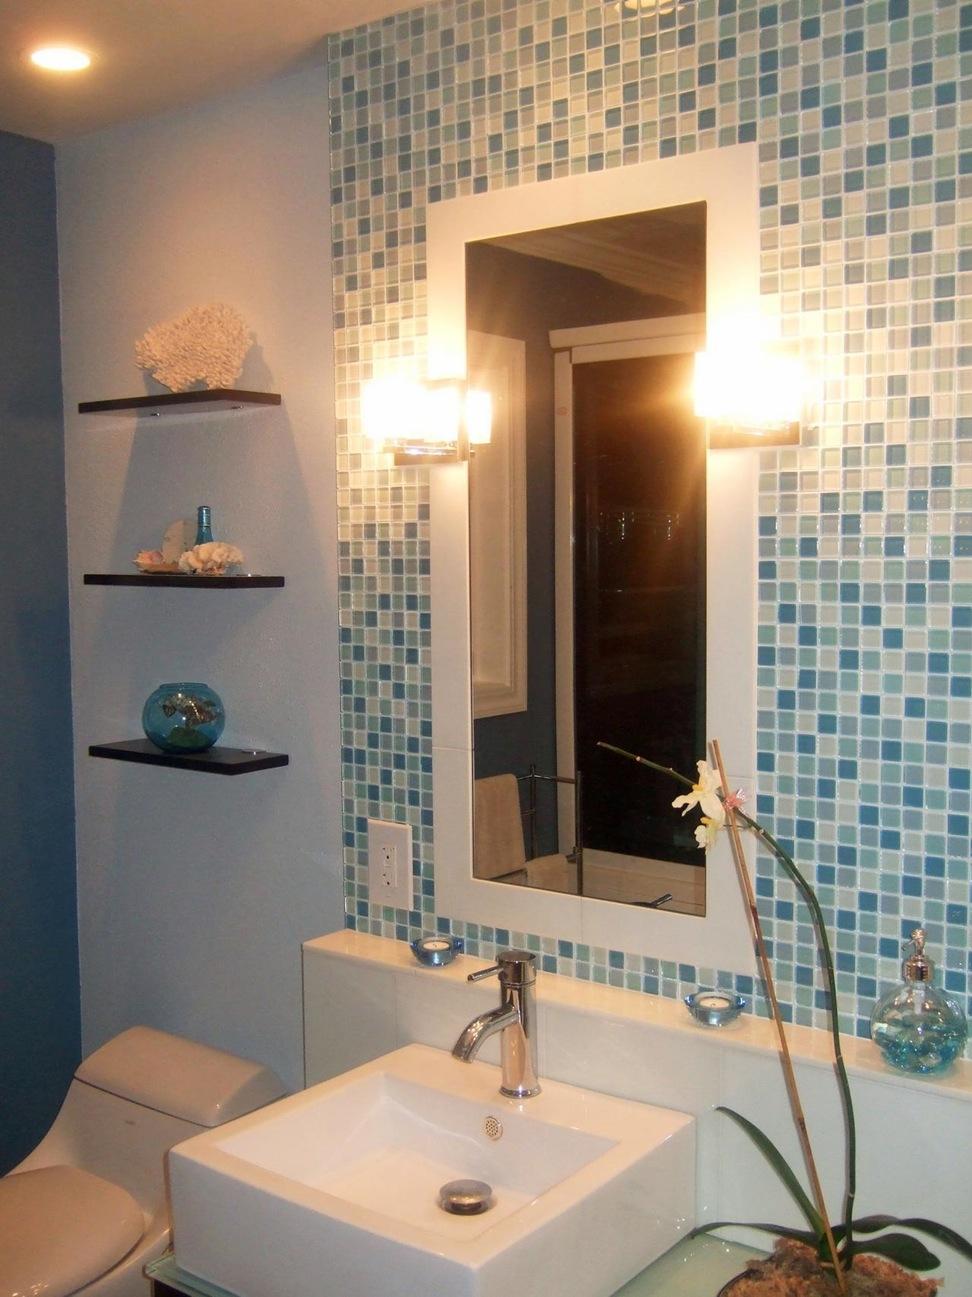 Mosaic Tile Behind Bathroom Mirror Bathroom Mirrors And Wall Mirrors